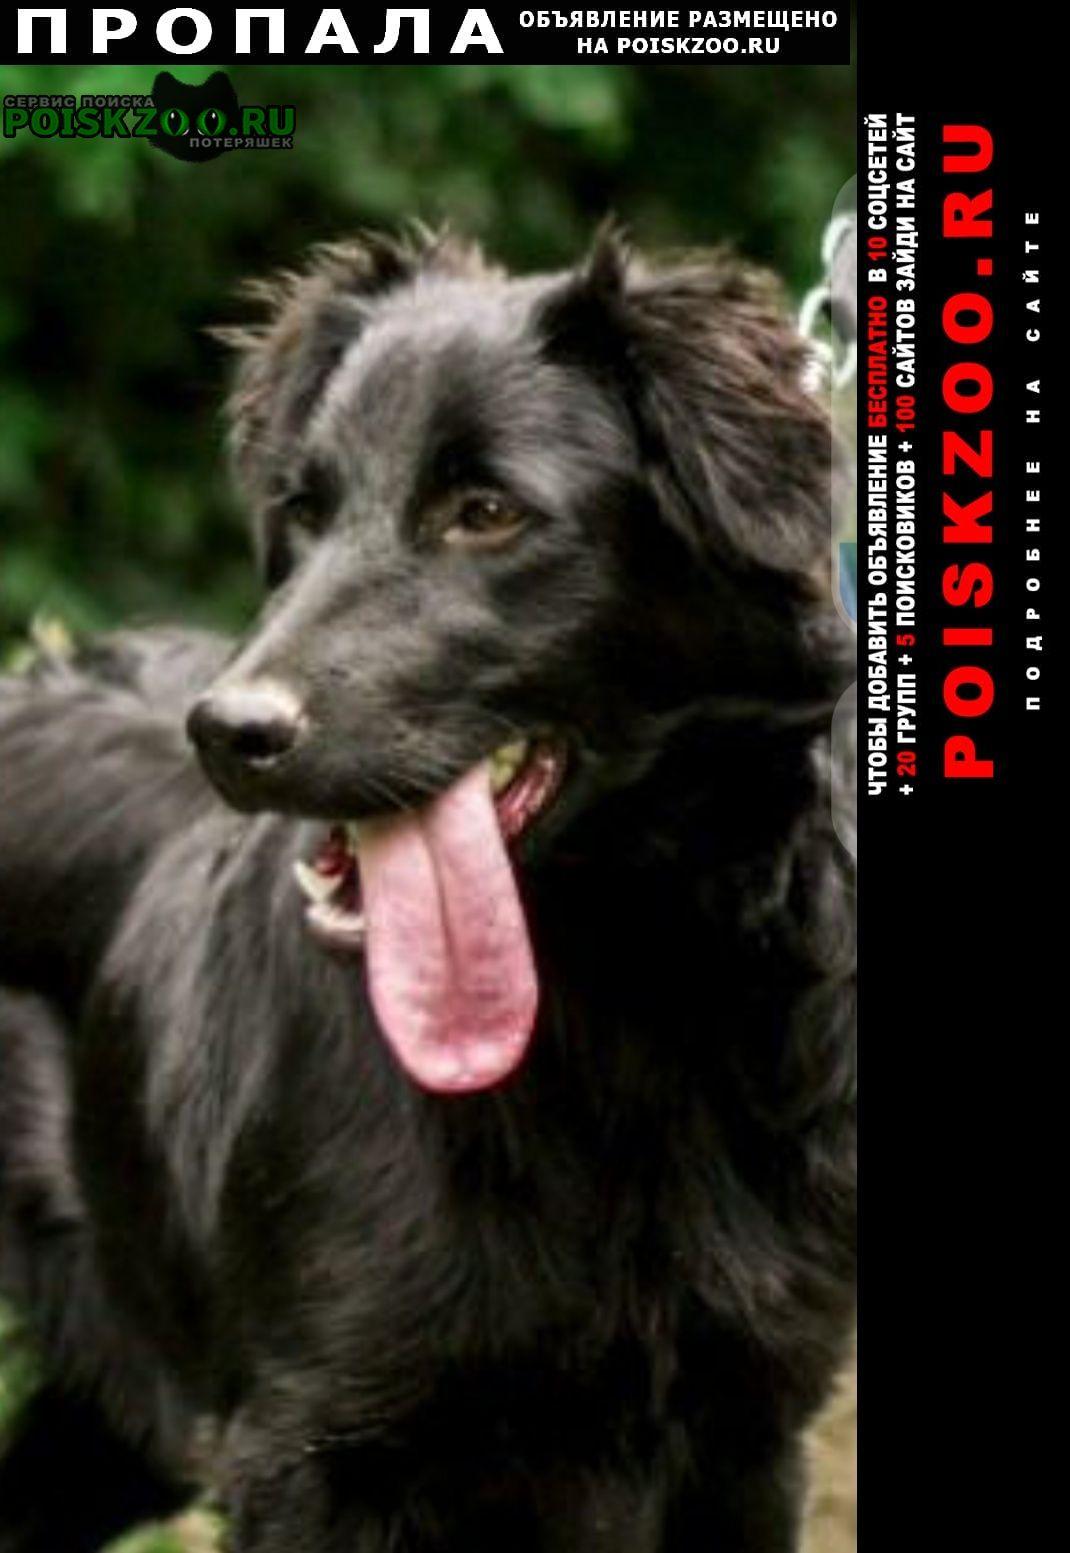 Пропала собака Малоярославец